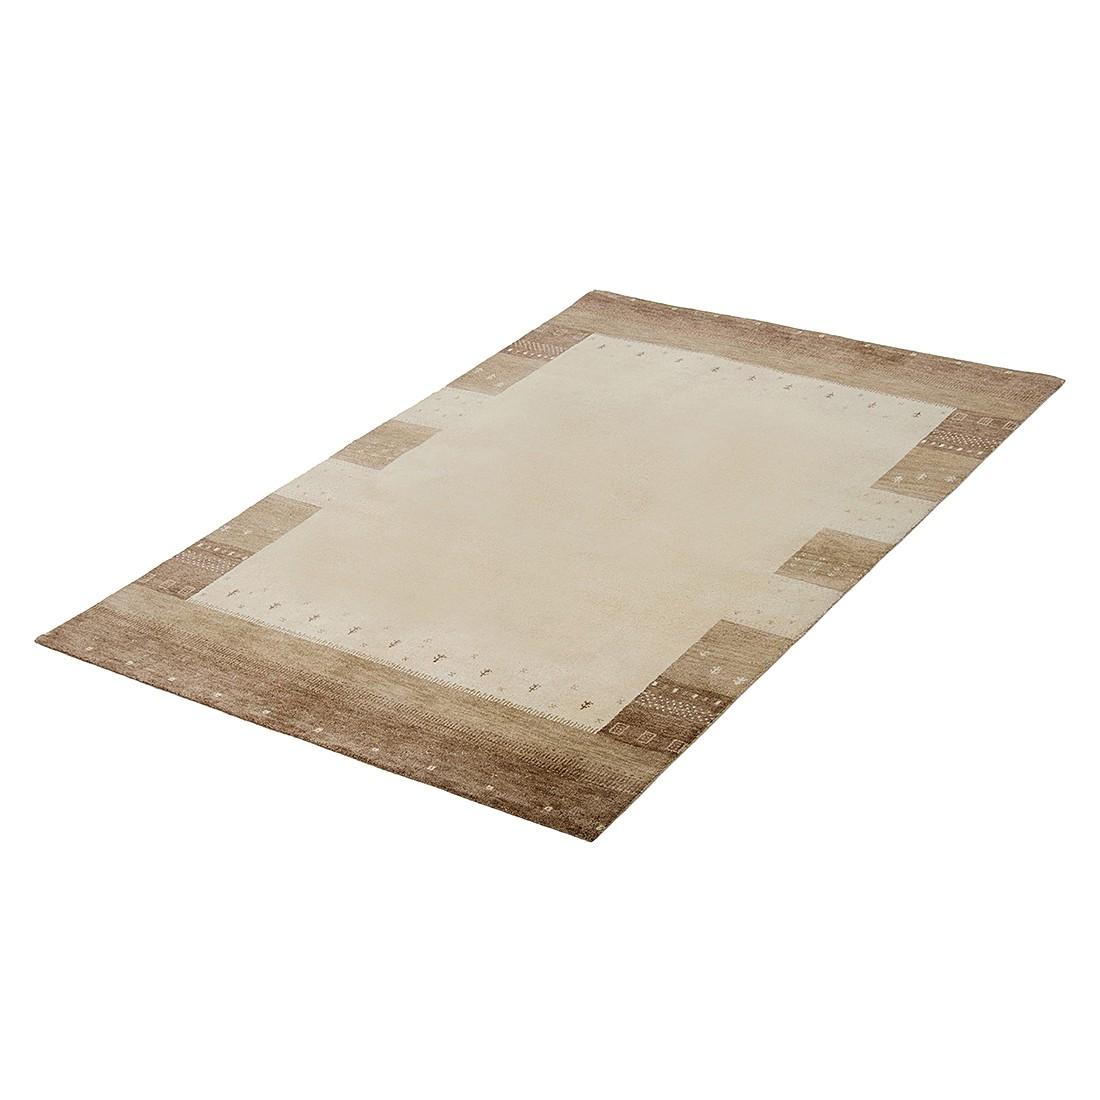 Teppich Ferrol Gabbeh – Camel – Maße: 60 x 40 cm, Parwis günstig kaufen